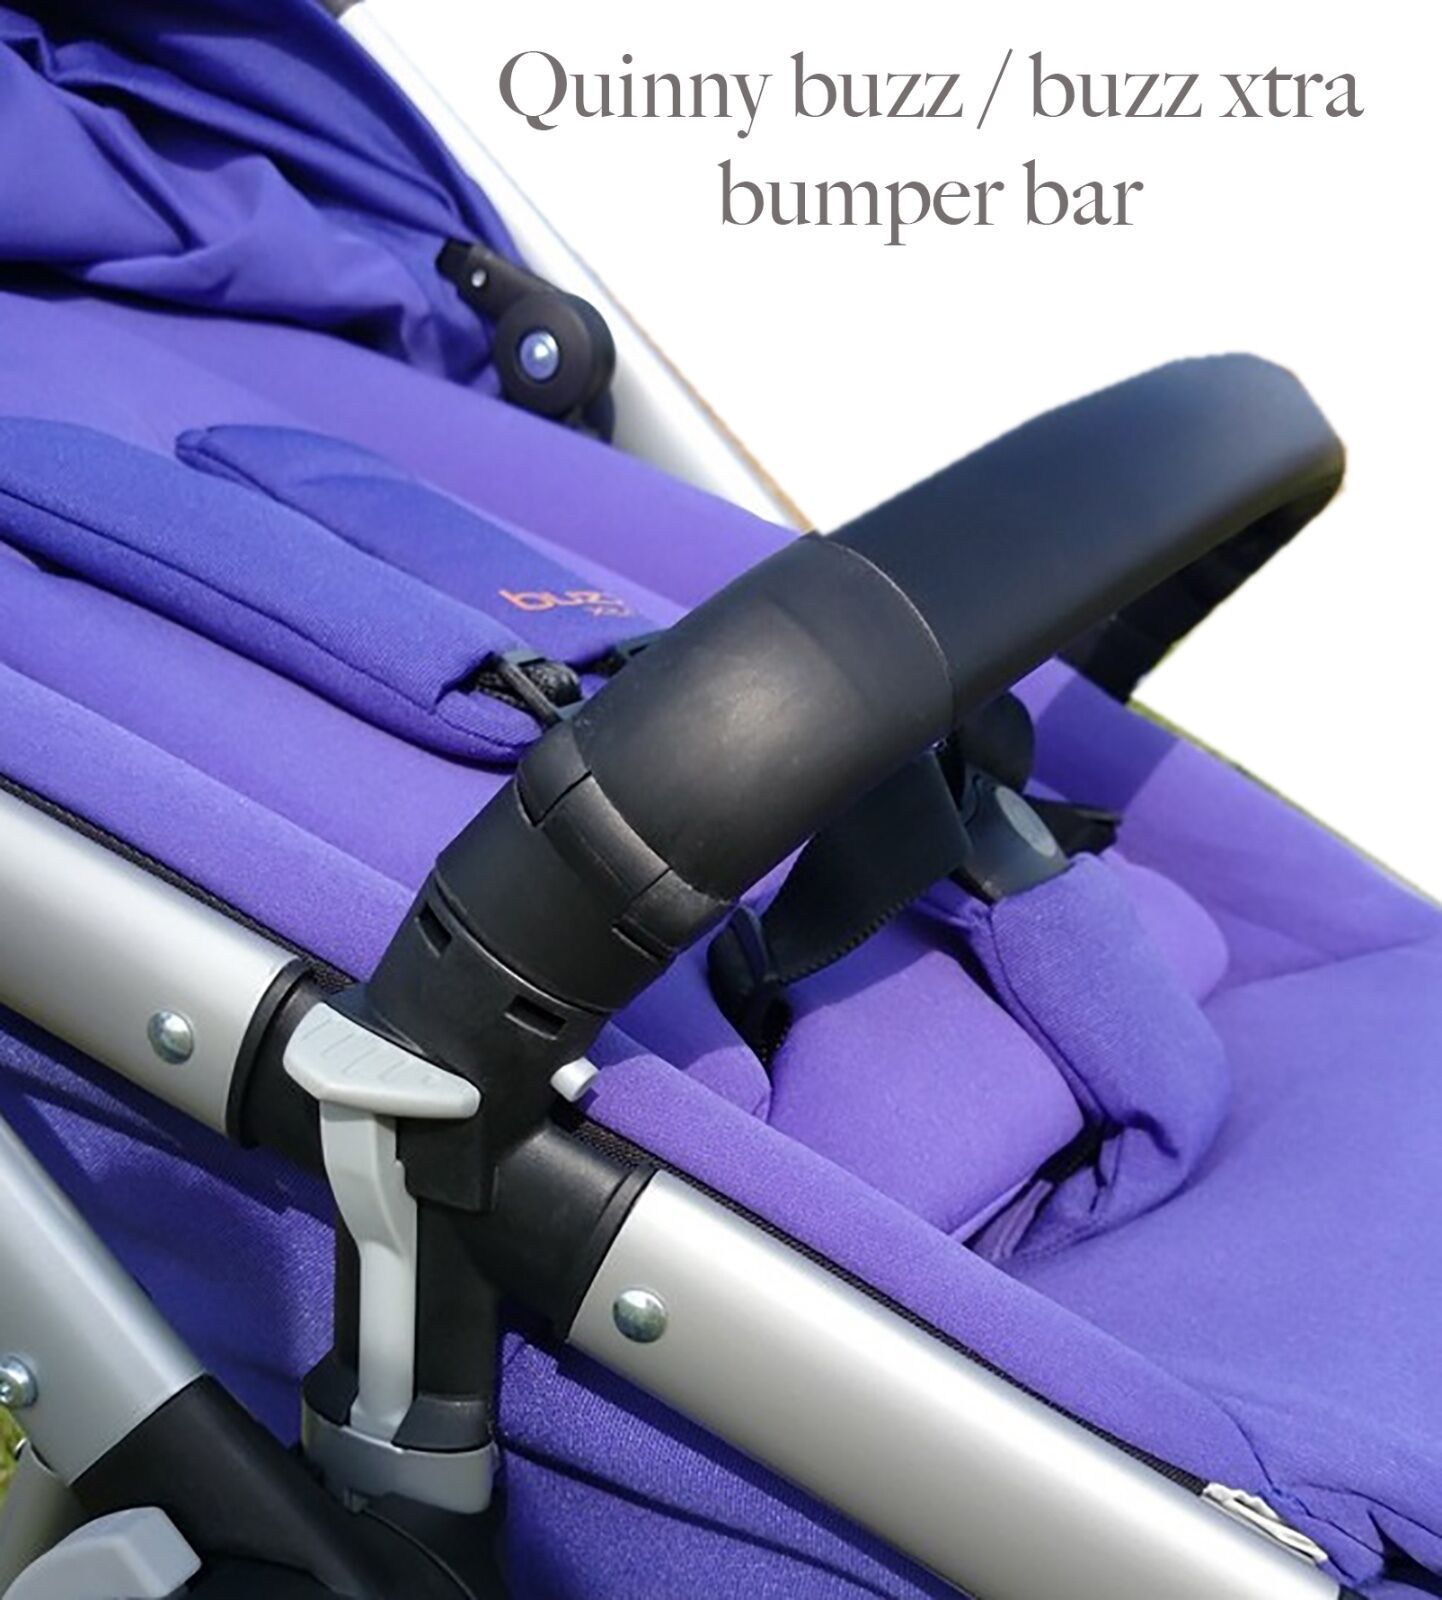 Pioneer//surf //Quinny buzz//my4 Bumper Bar Cover Fit silver cross Wayfarer